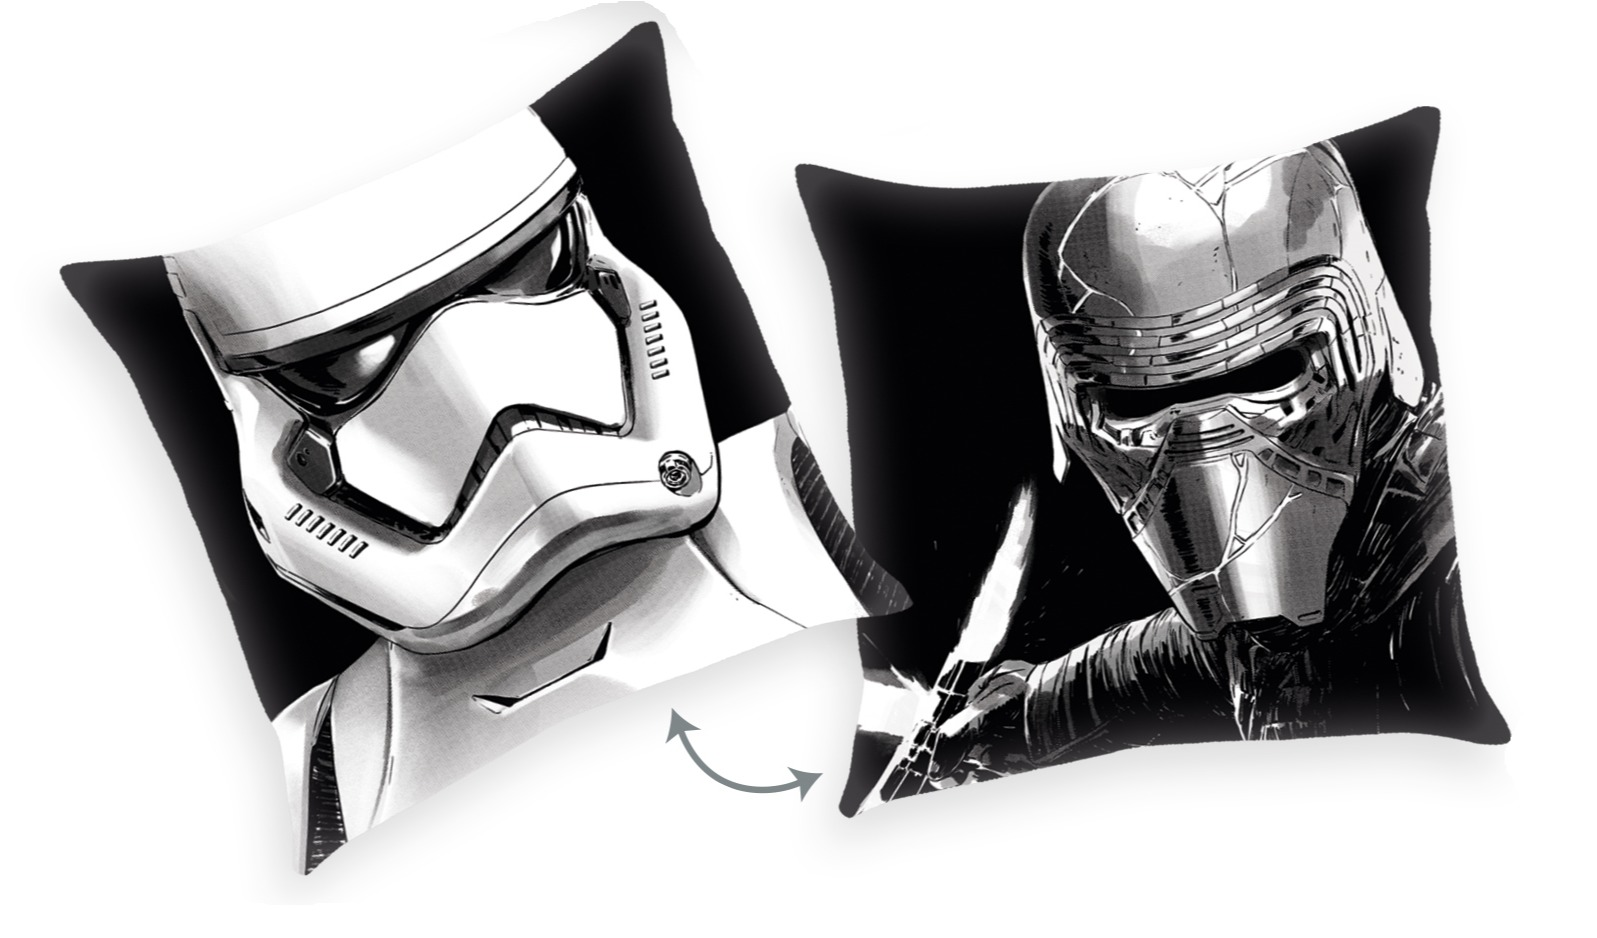 Polštář Star Wars - Kylo Ren/Stormtrooper (PC)